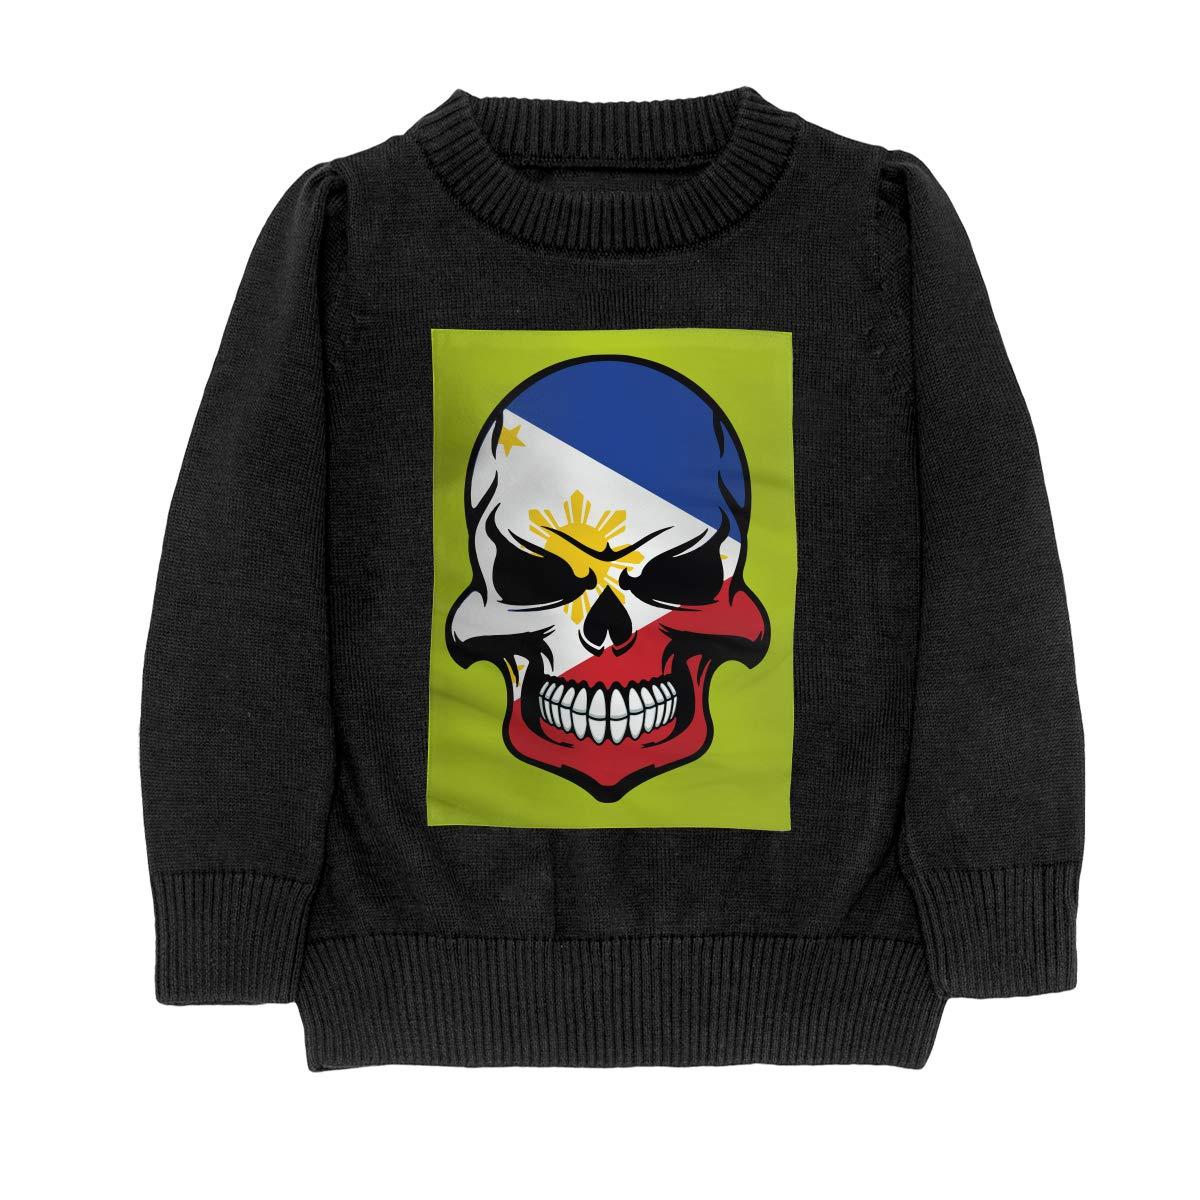 WWTBBJ-B Filipino Flag Skull Cool Philippines Skull Casual Teenager Boys Girls Unisex Sweater Keep Warm